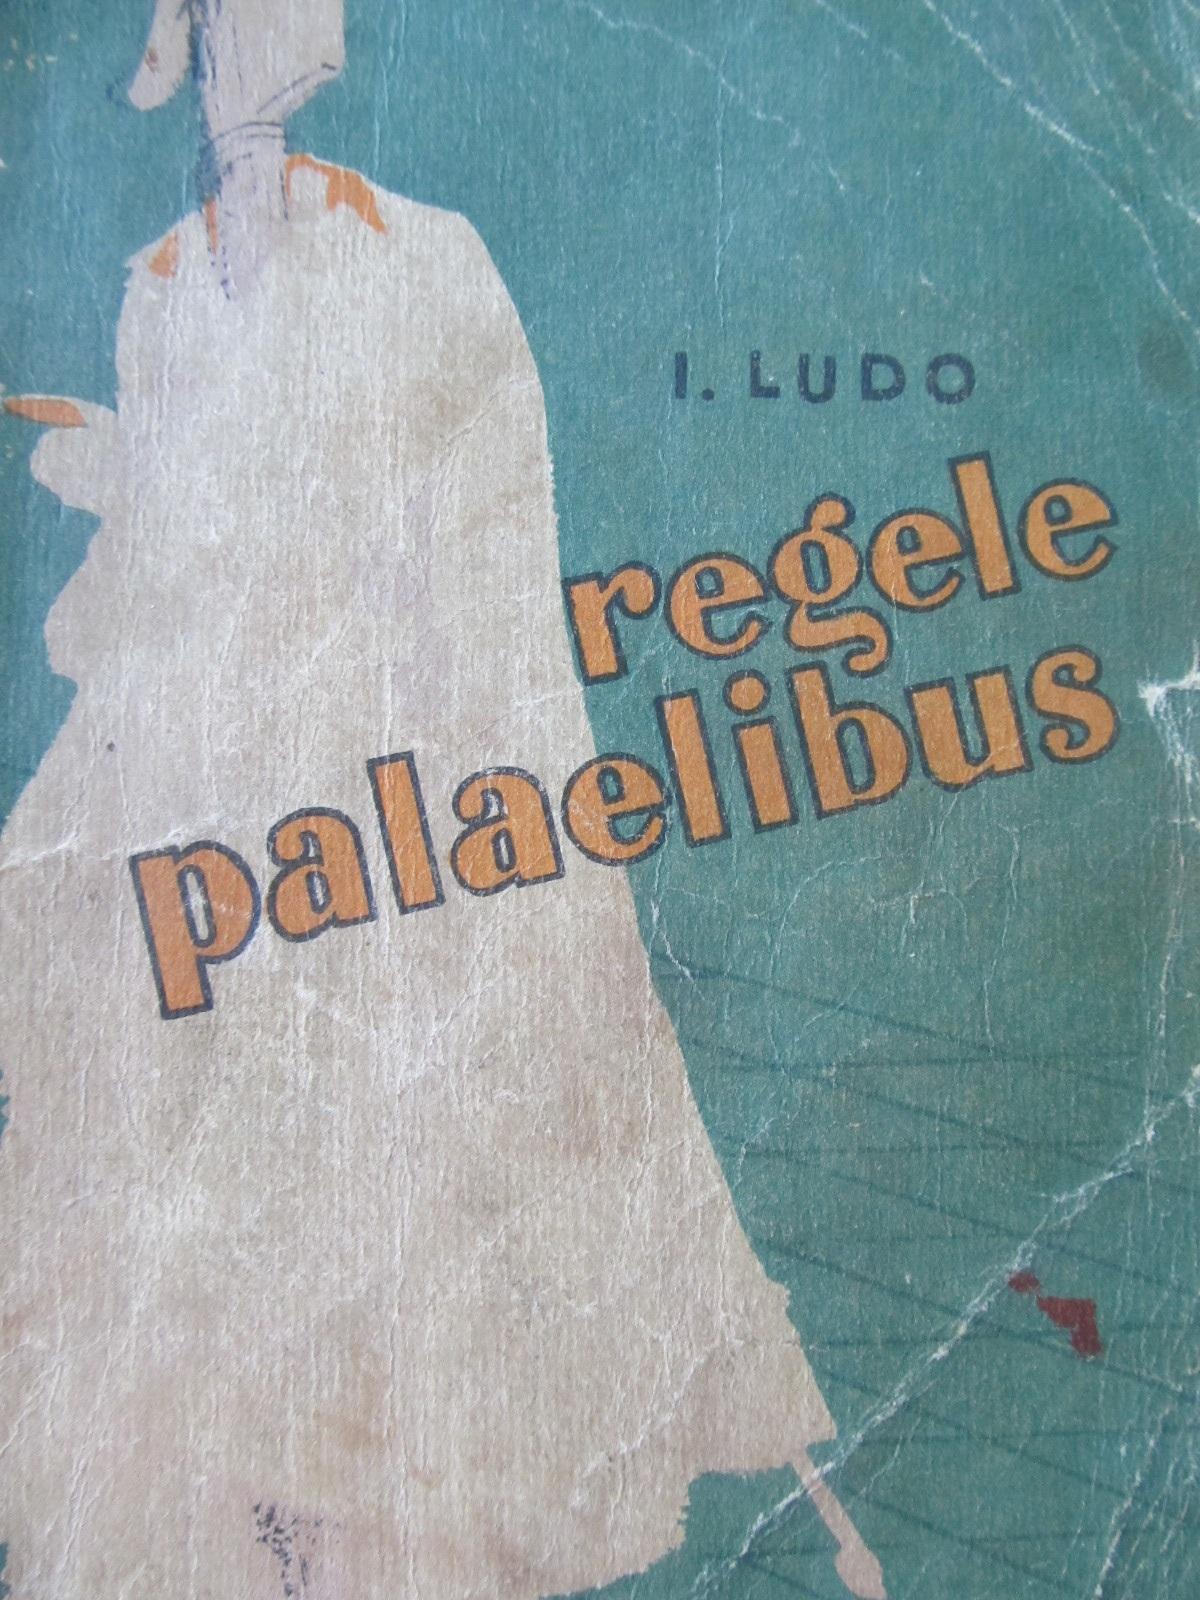 Carte Regele Palaelibus - I. Ludo